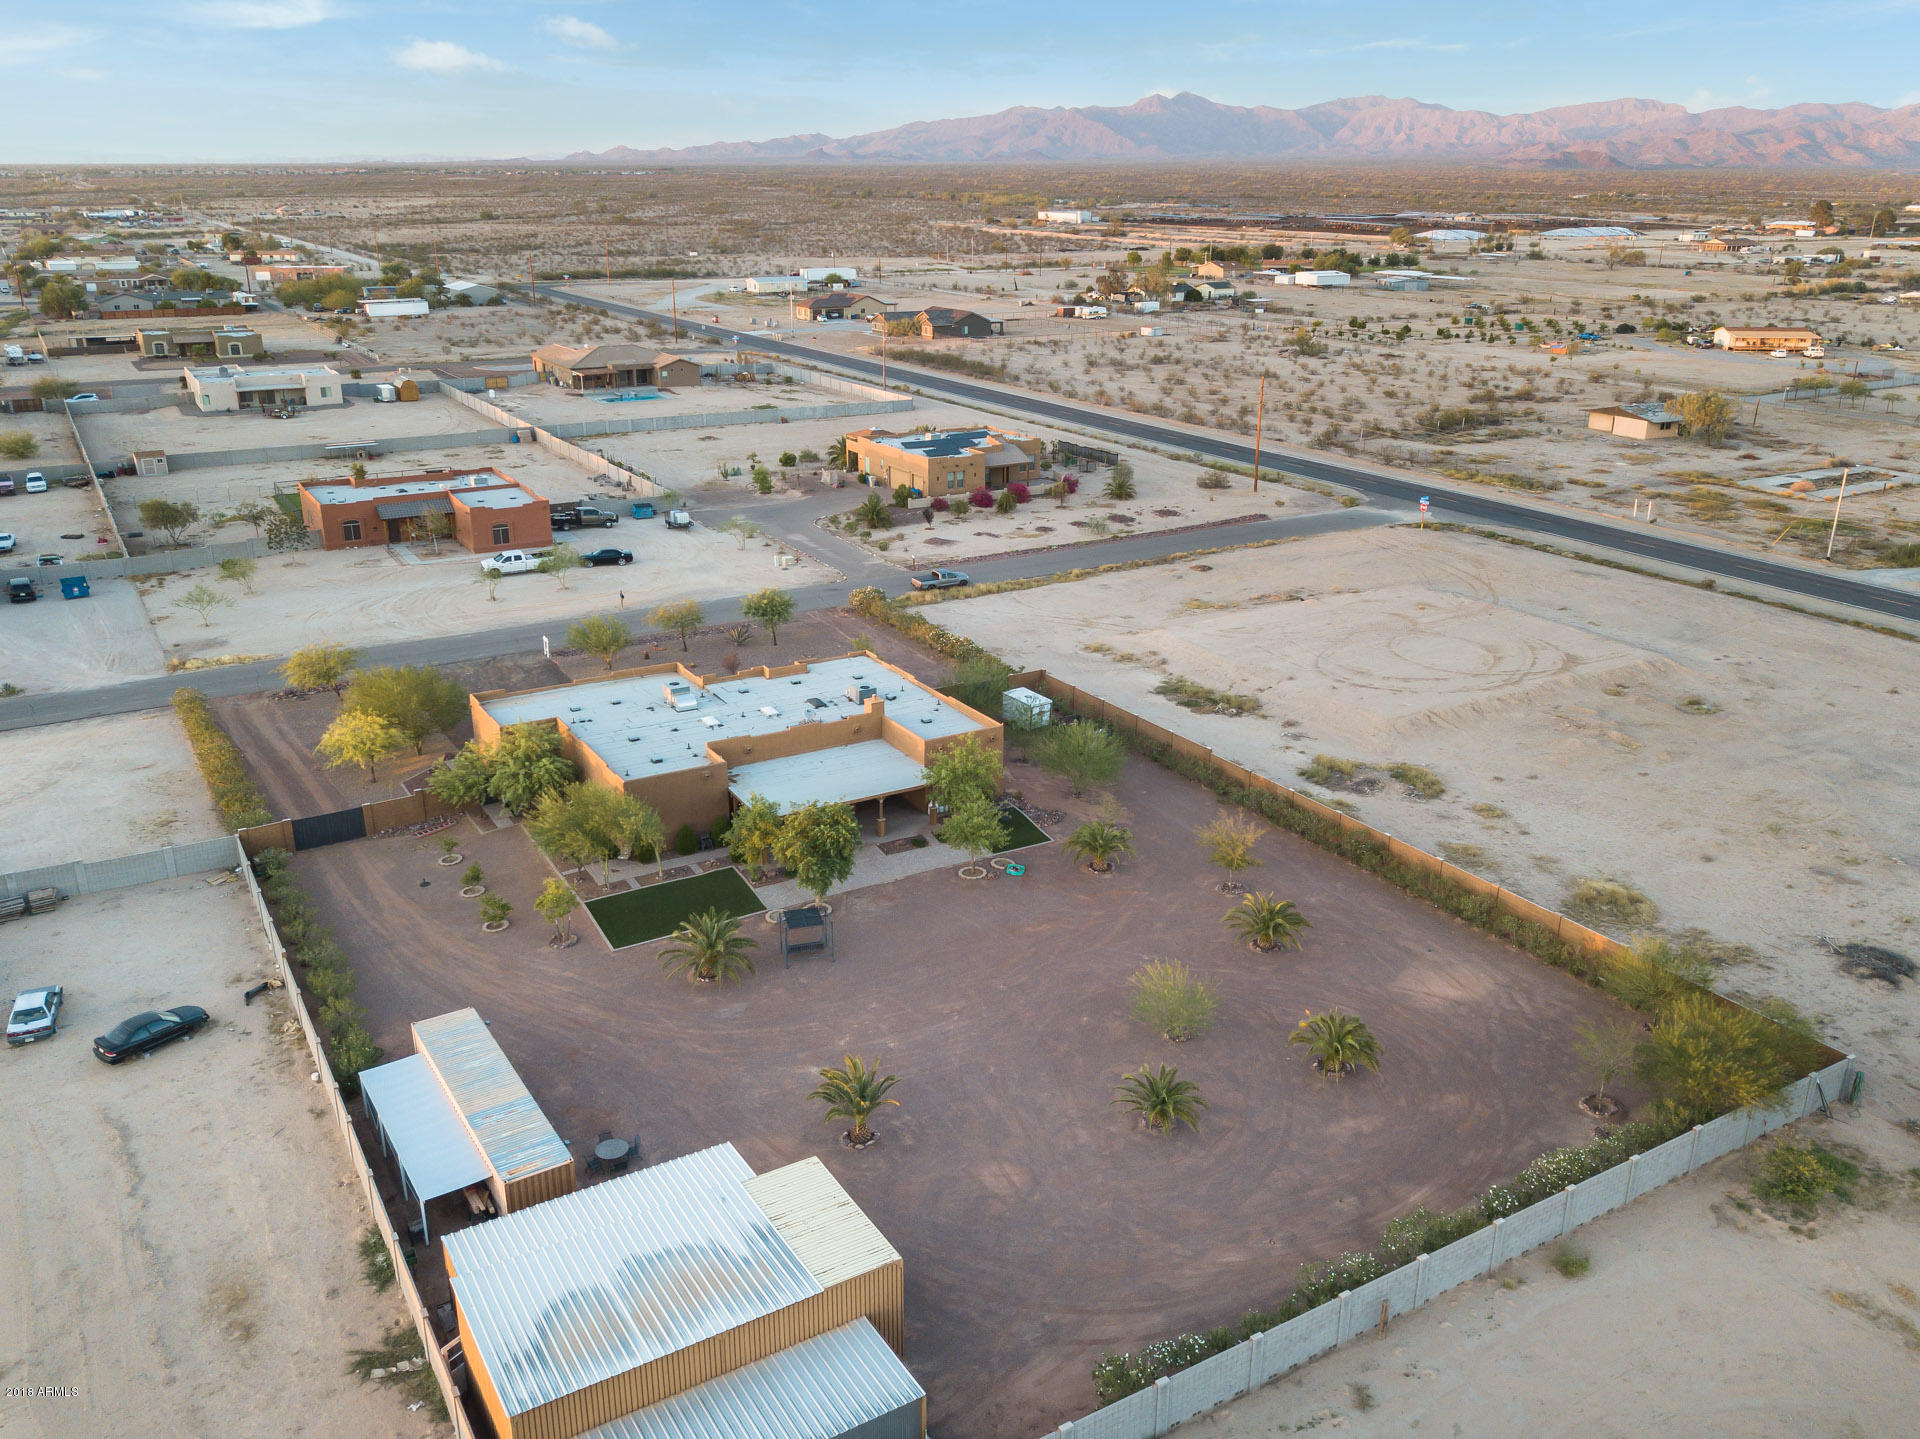 MLS 5823868 29919 W PIERCE Street, Buckeye, AZ 85396 Buckeye AZ West Phoenix Estates